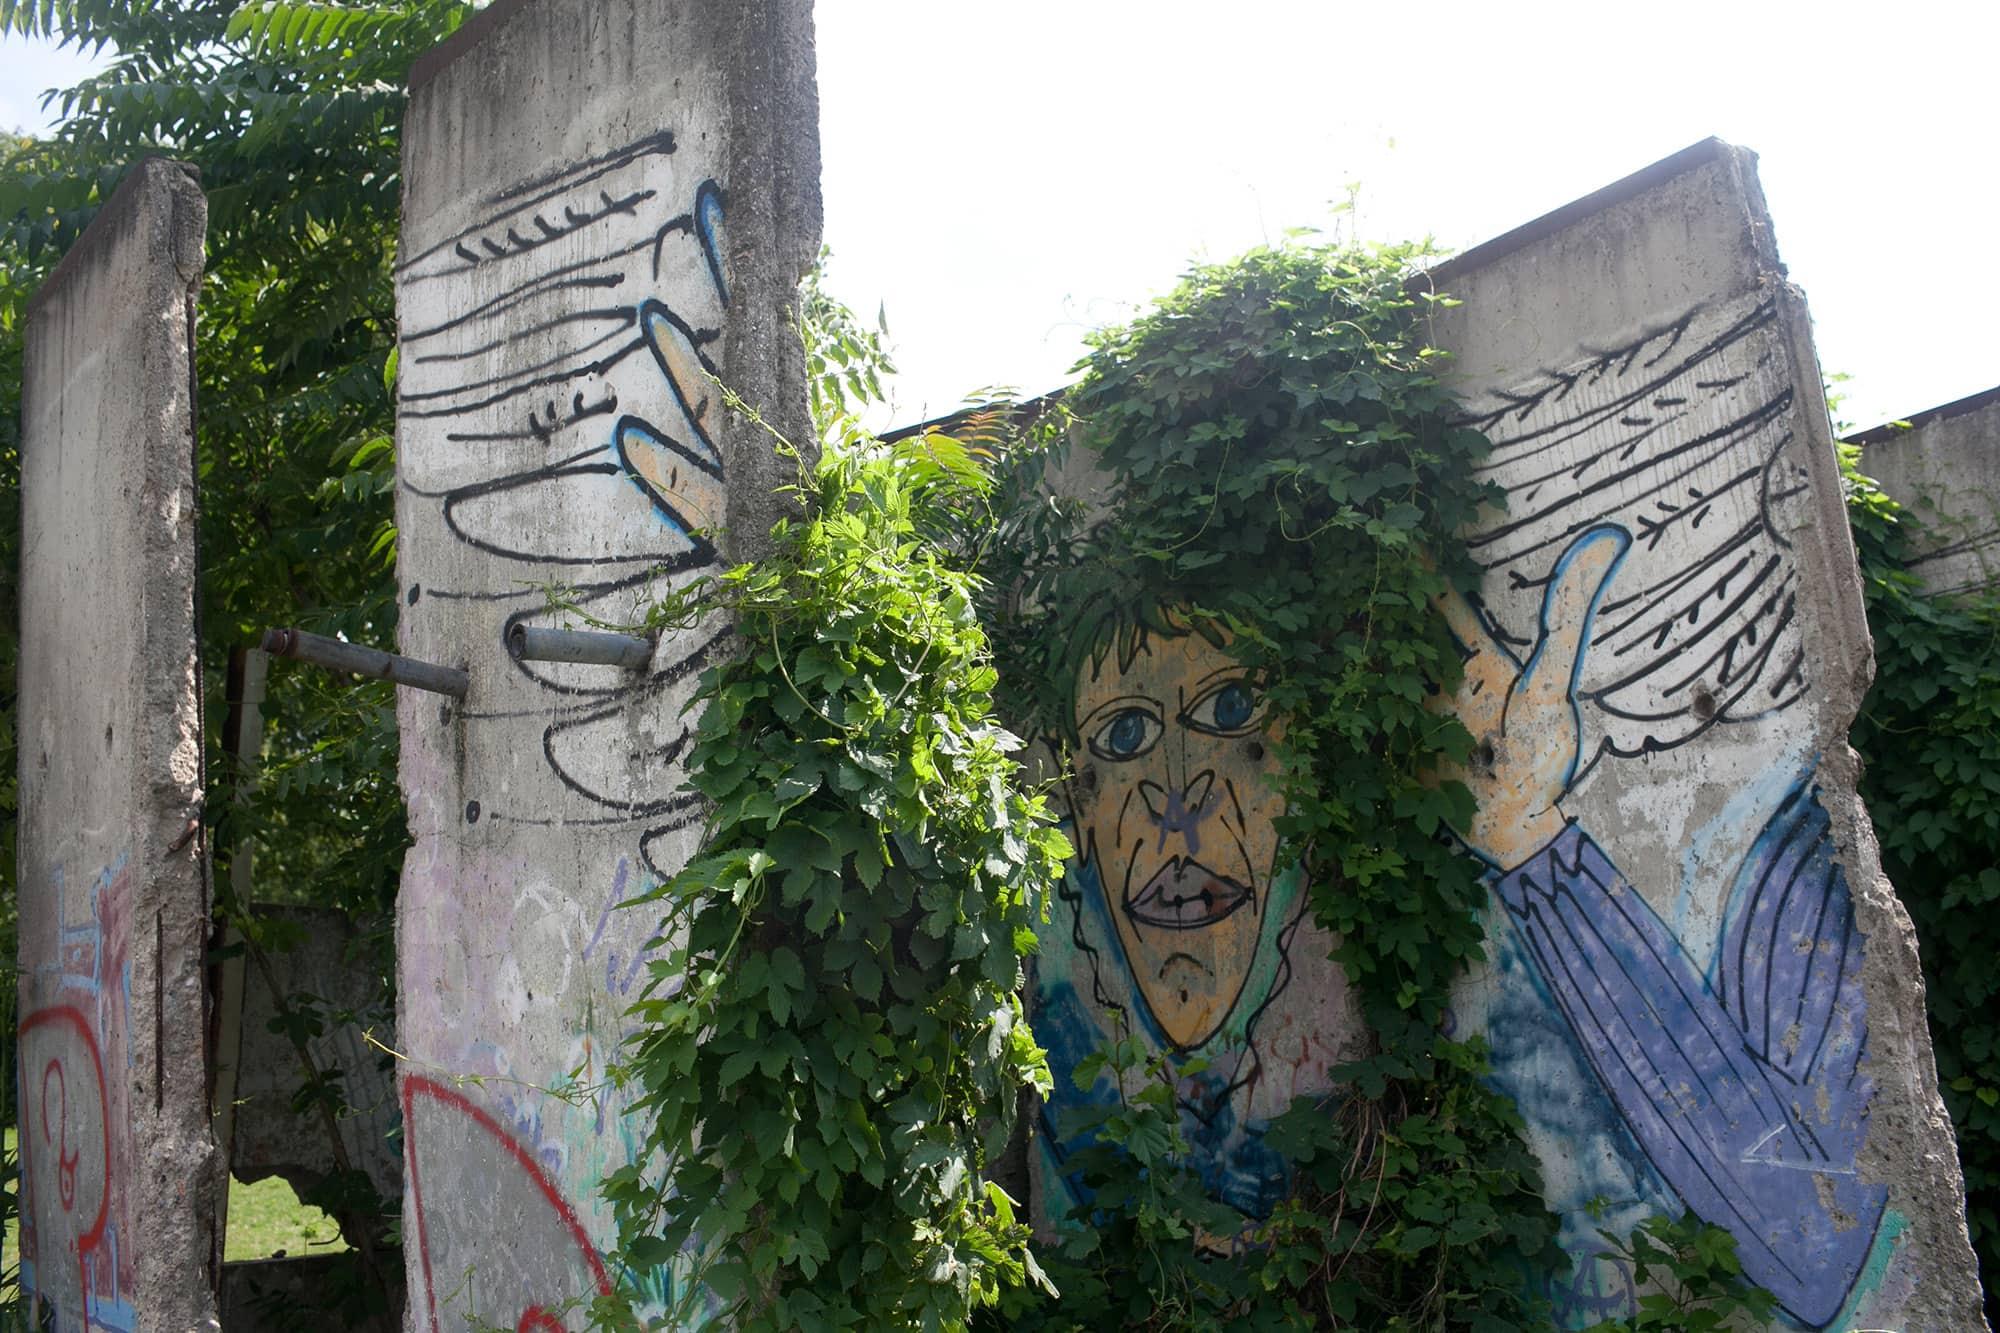 Wall documentation center in Berlin